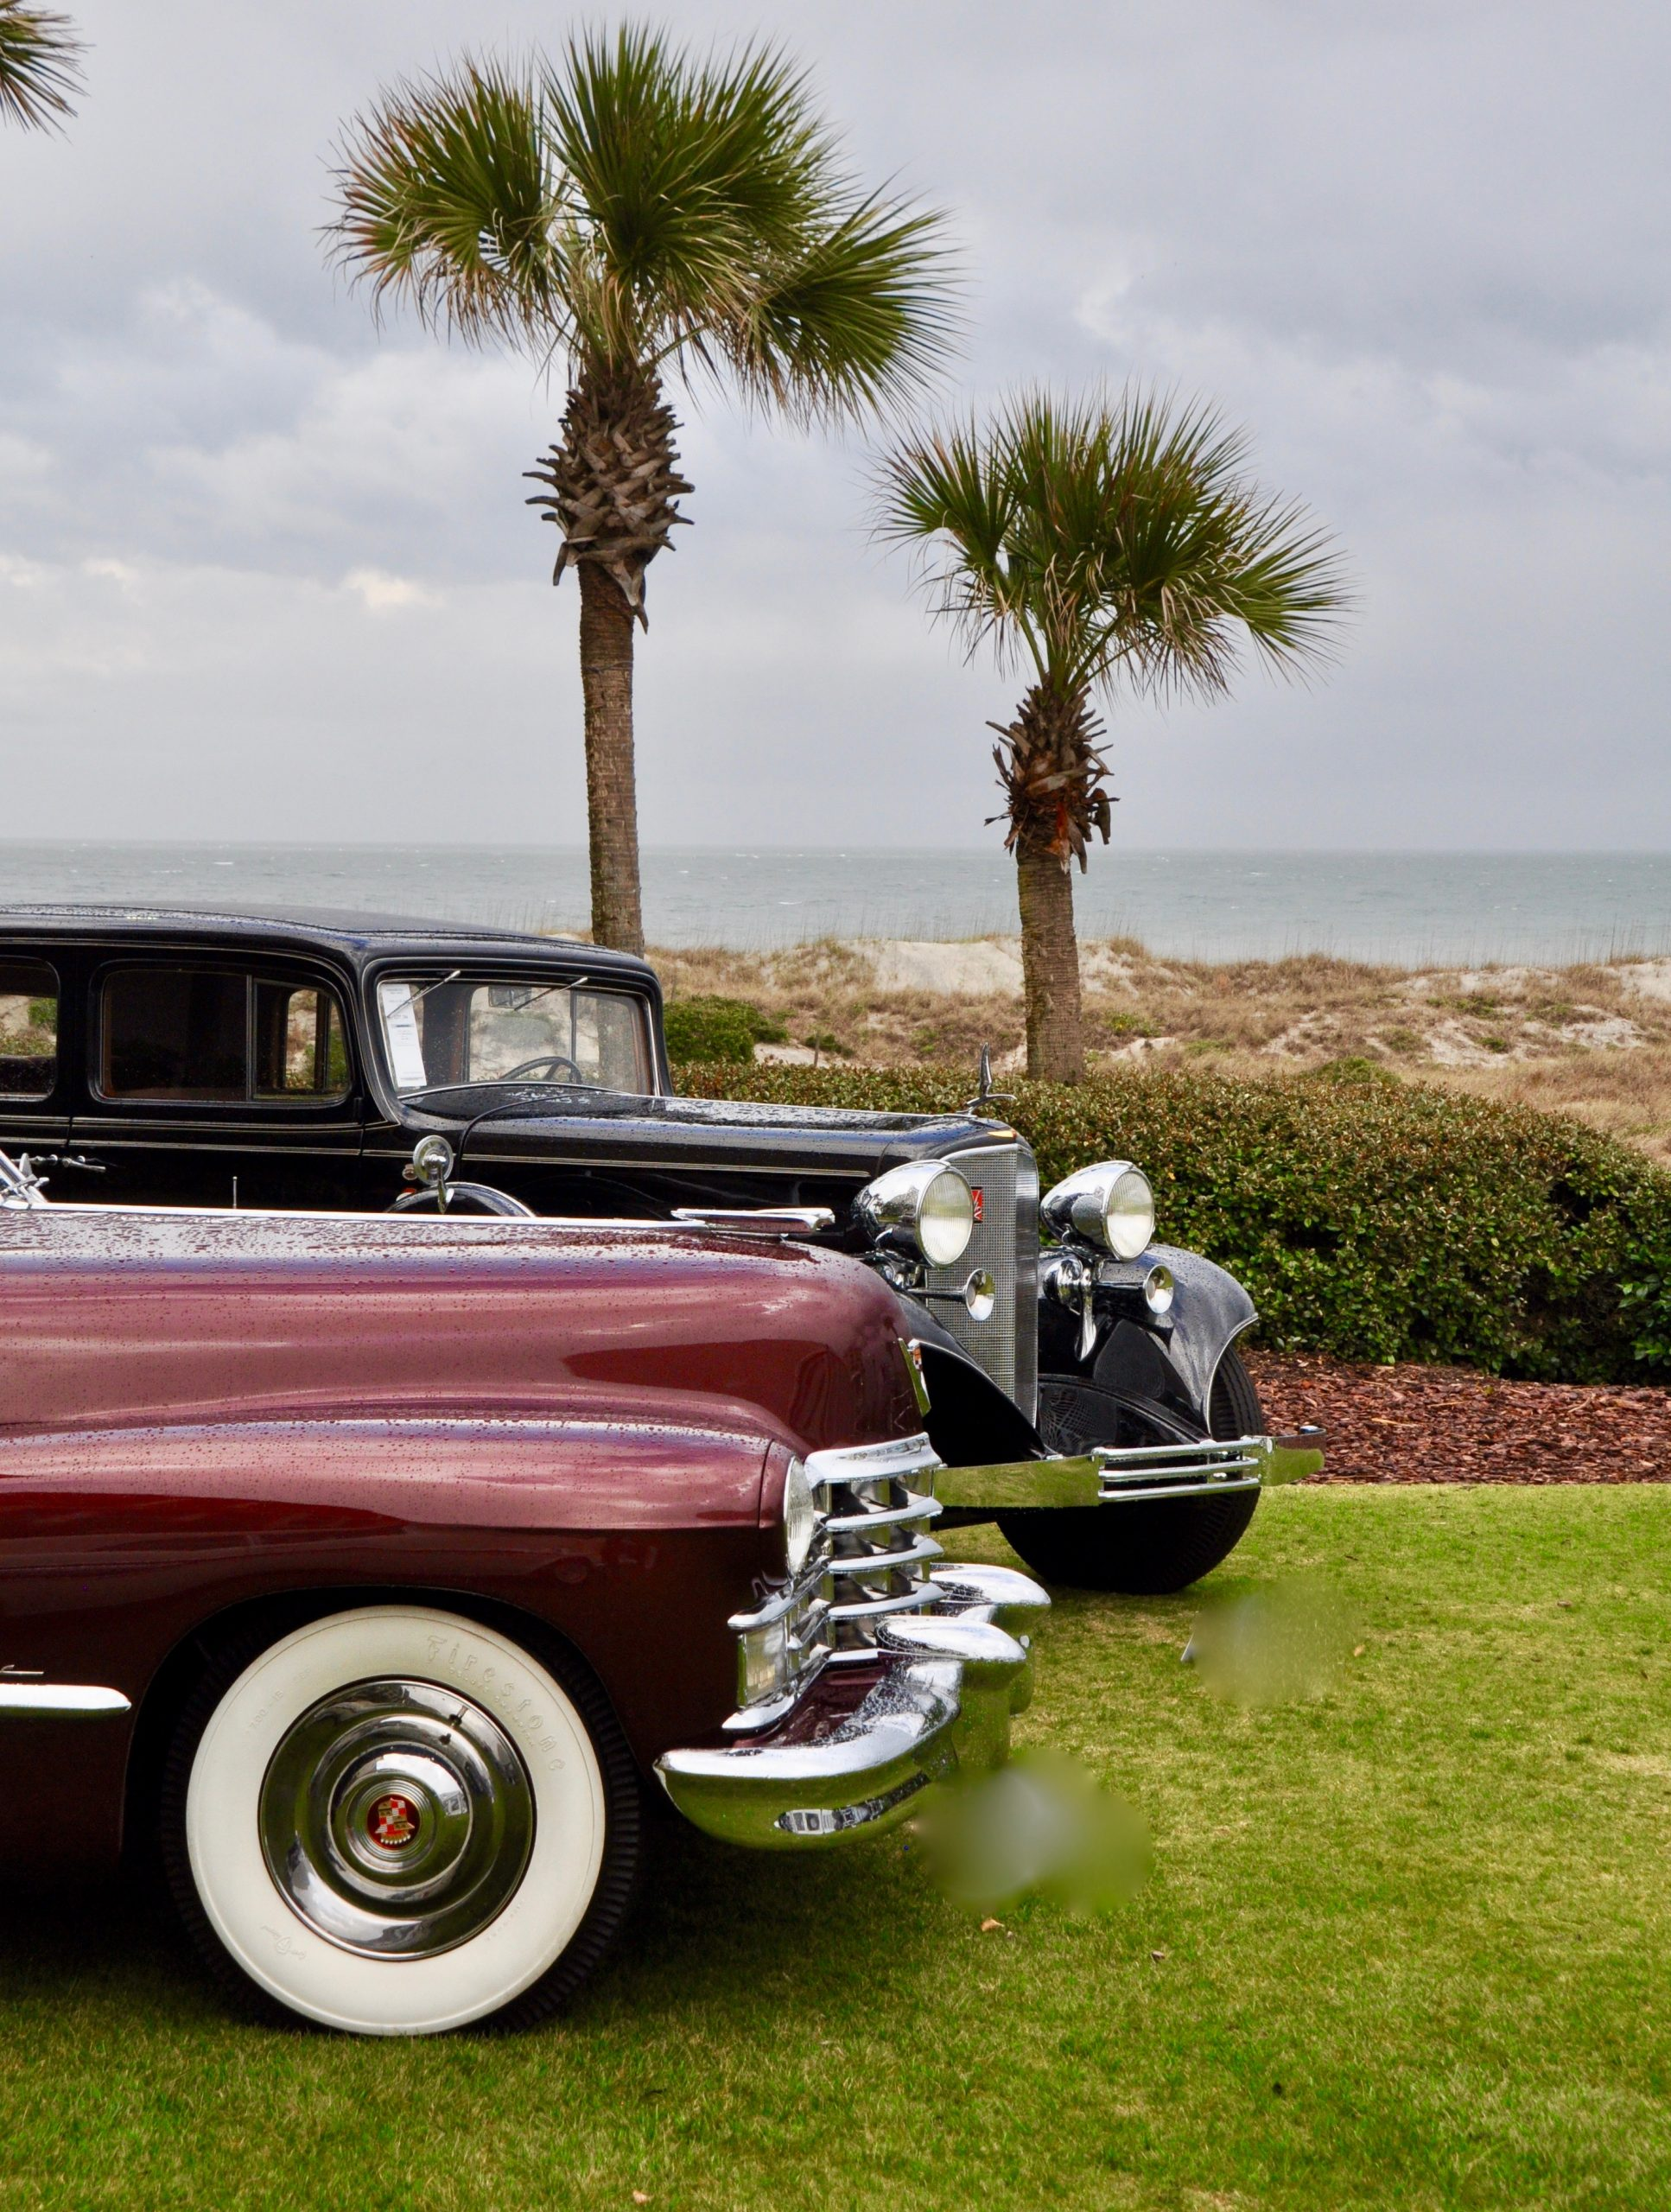 Automotive Heritage Foundation Bulletin #4 April 26 2021